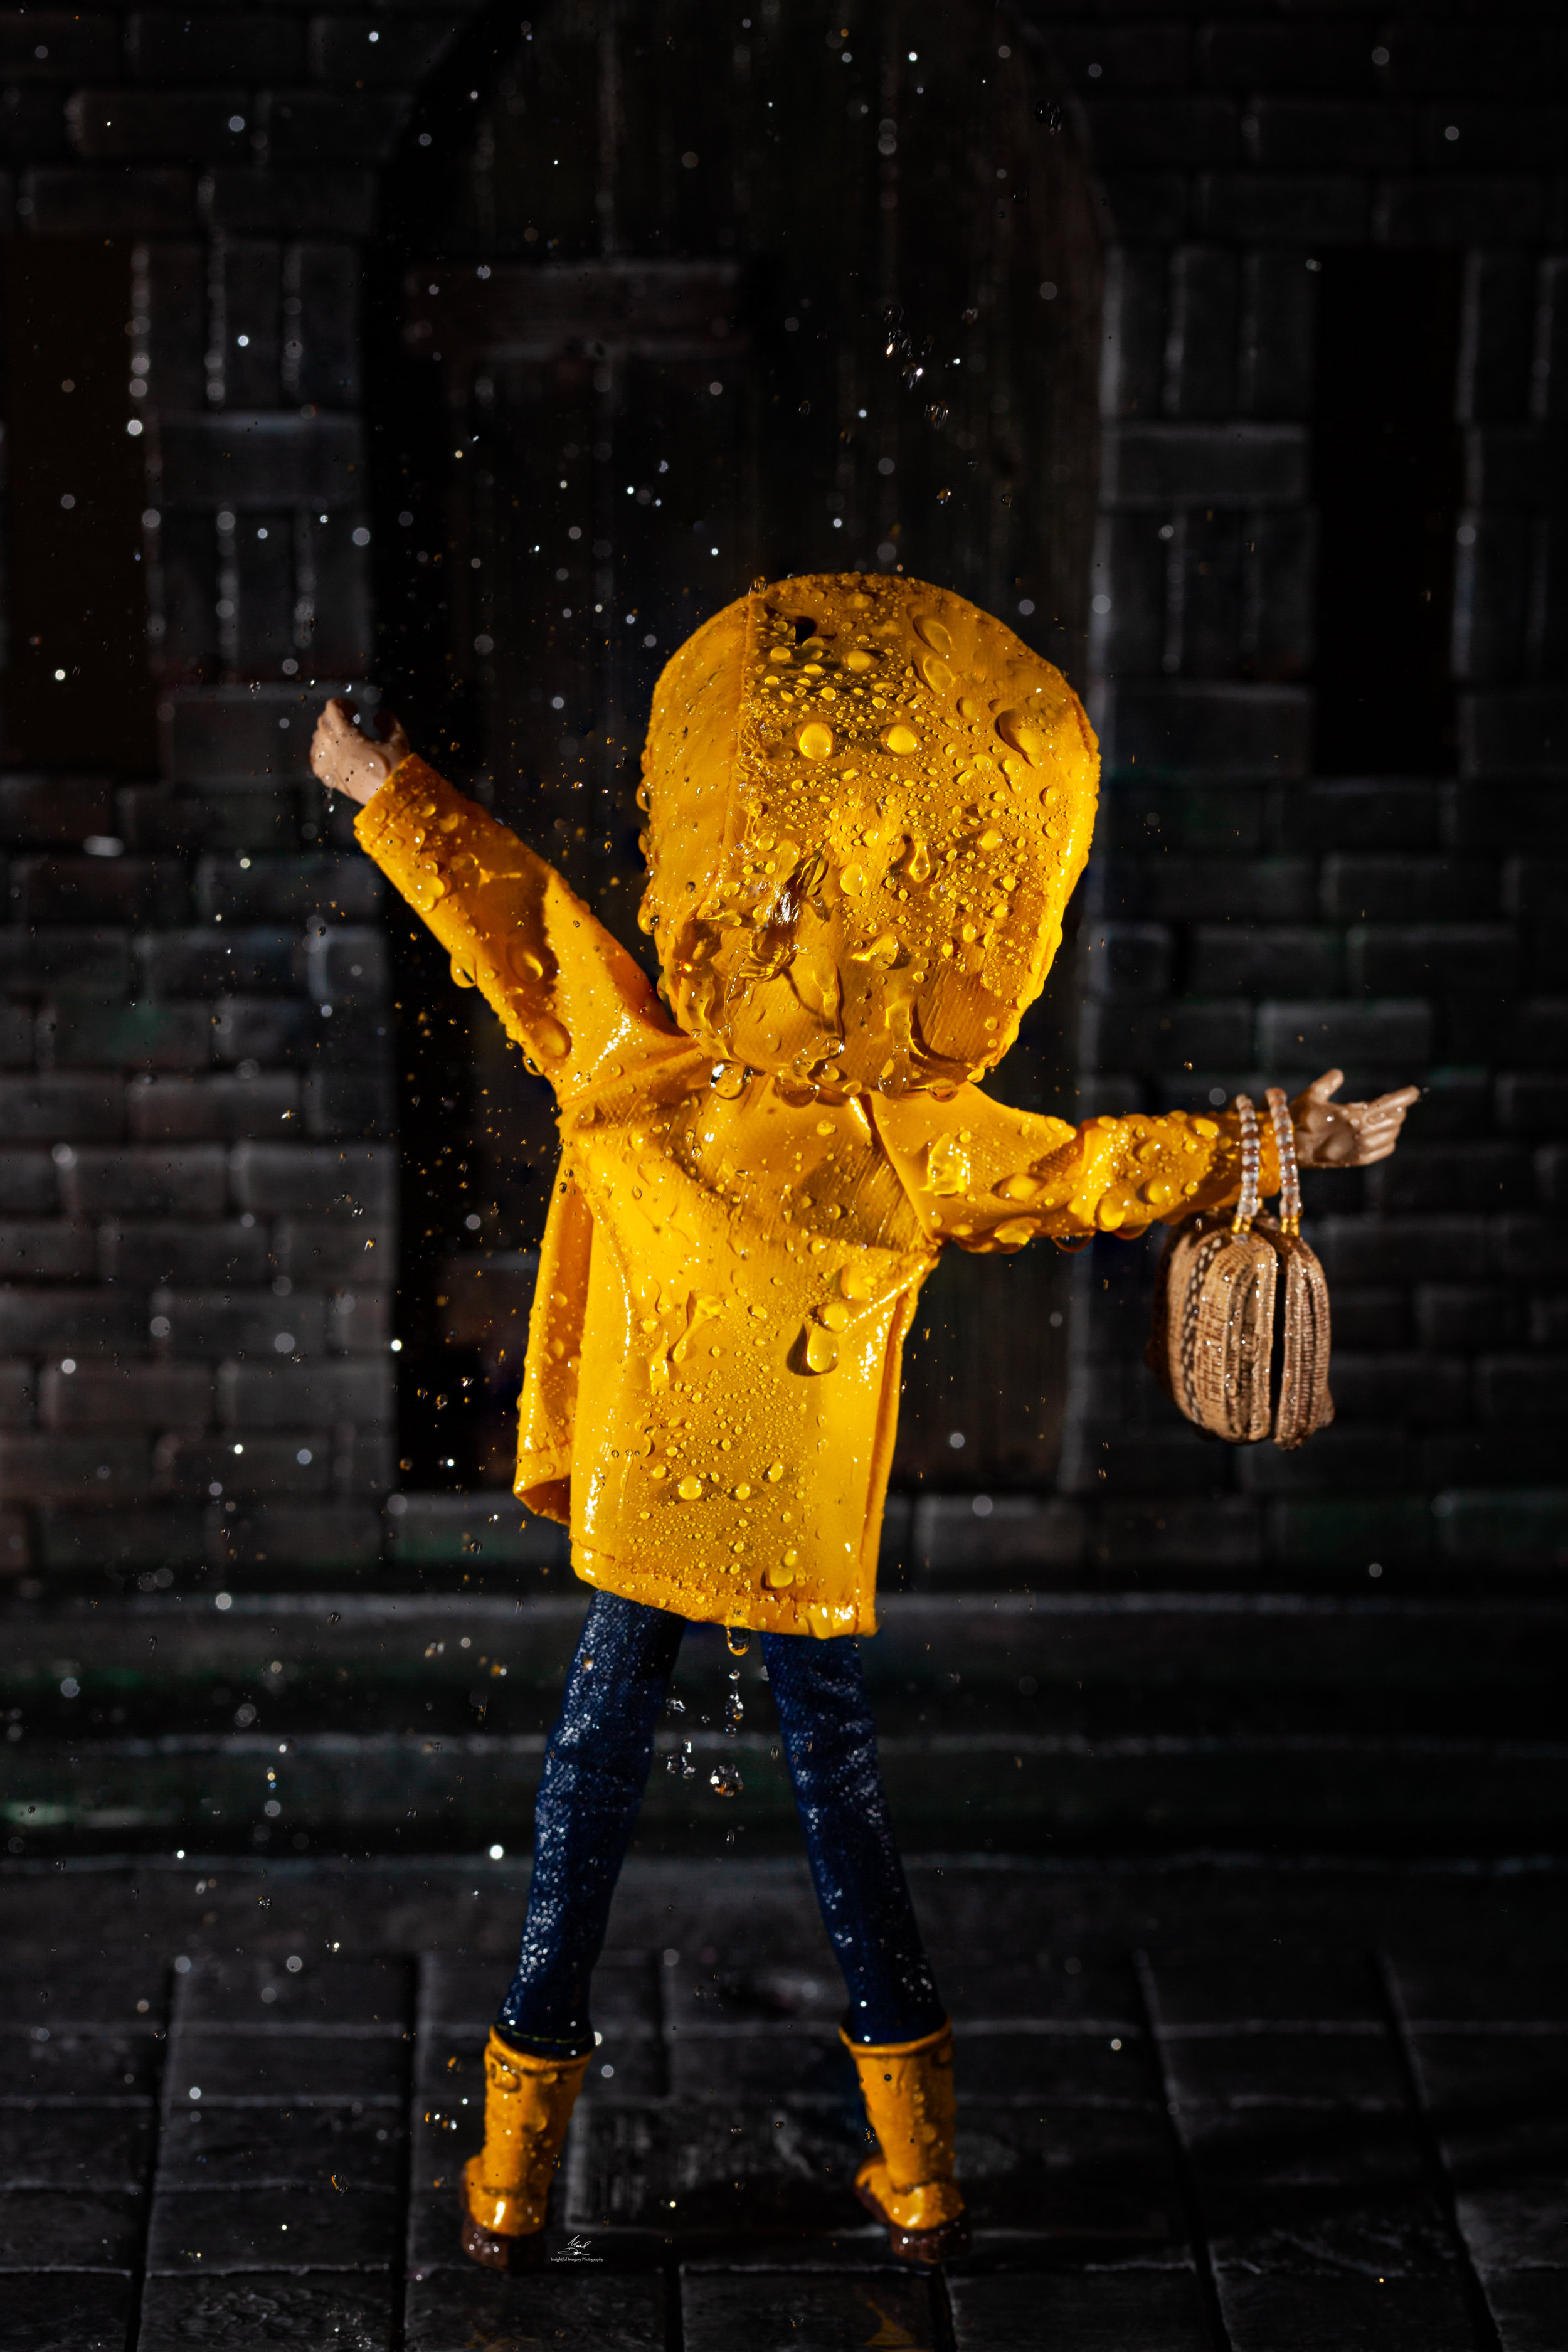 Coraline In Her Rain Coat Insightful Imagery